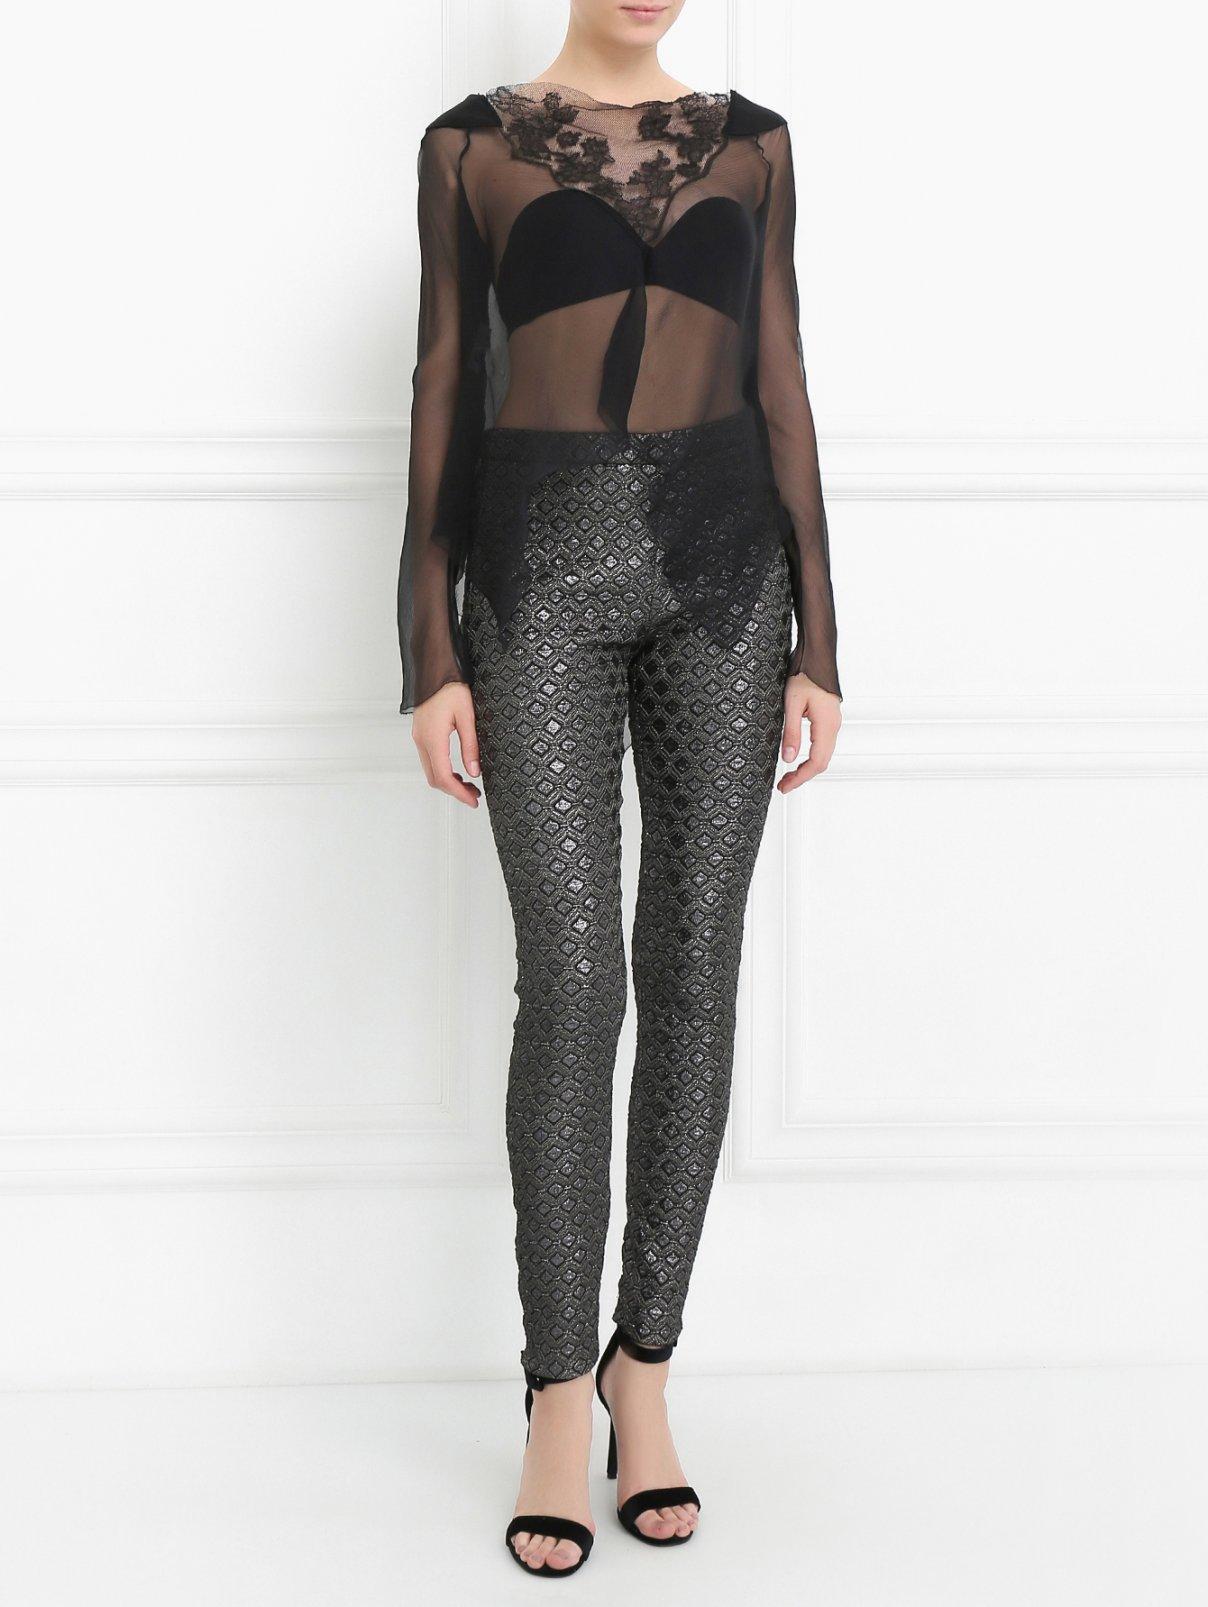 Узкие брюки с узором Giamba  –  Модель Общий вид